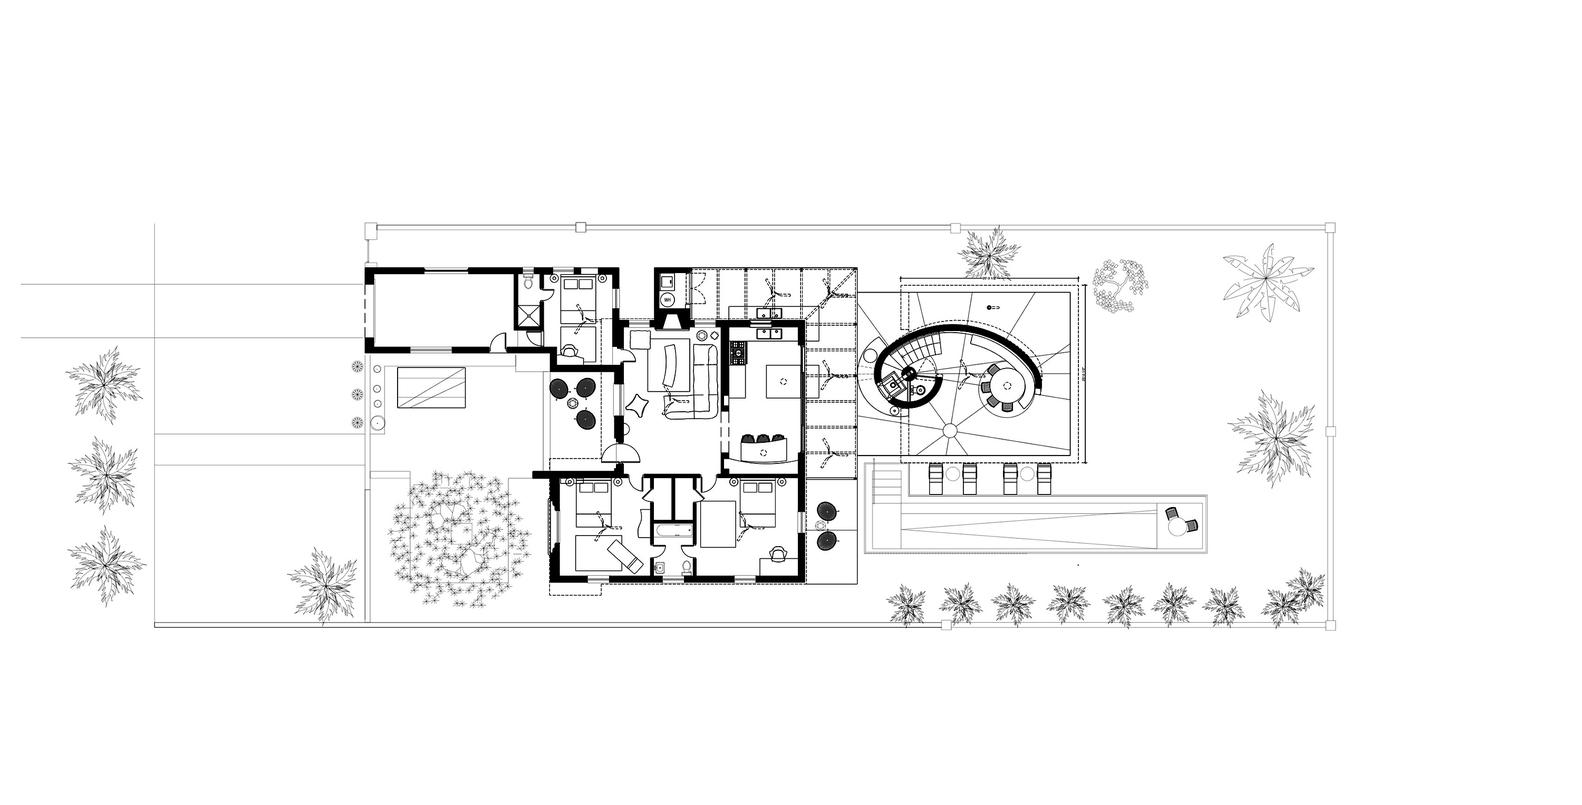 Gallery of sun path house christian wassmann 17 sun path housefirst floor plan pooptronica